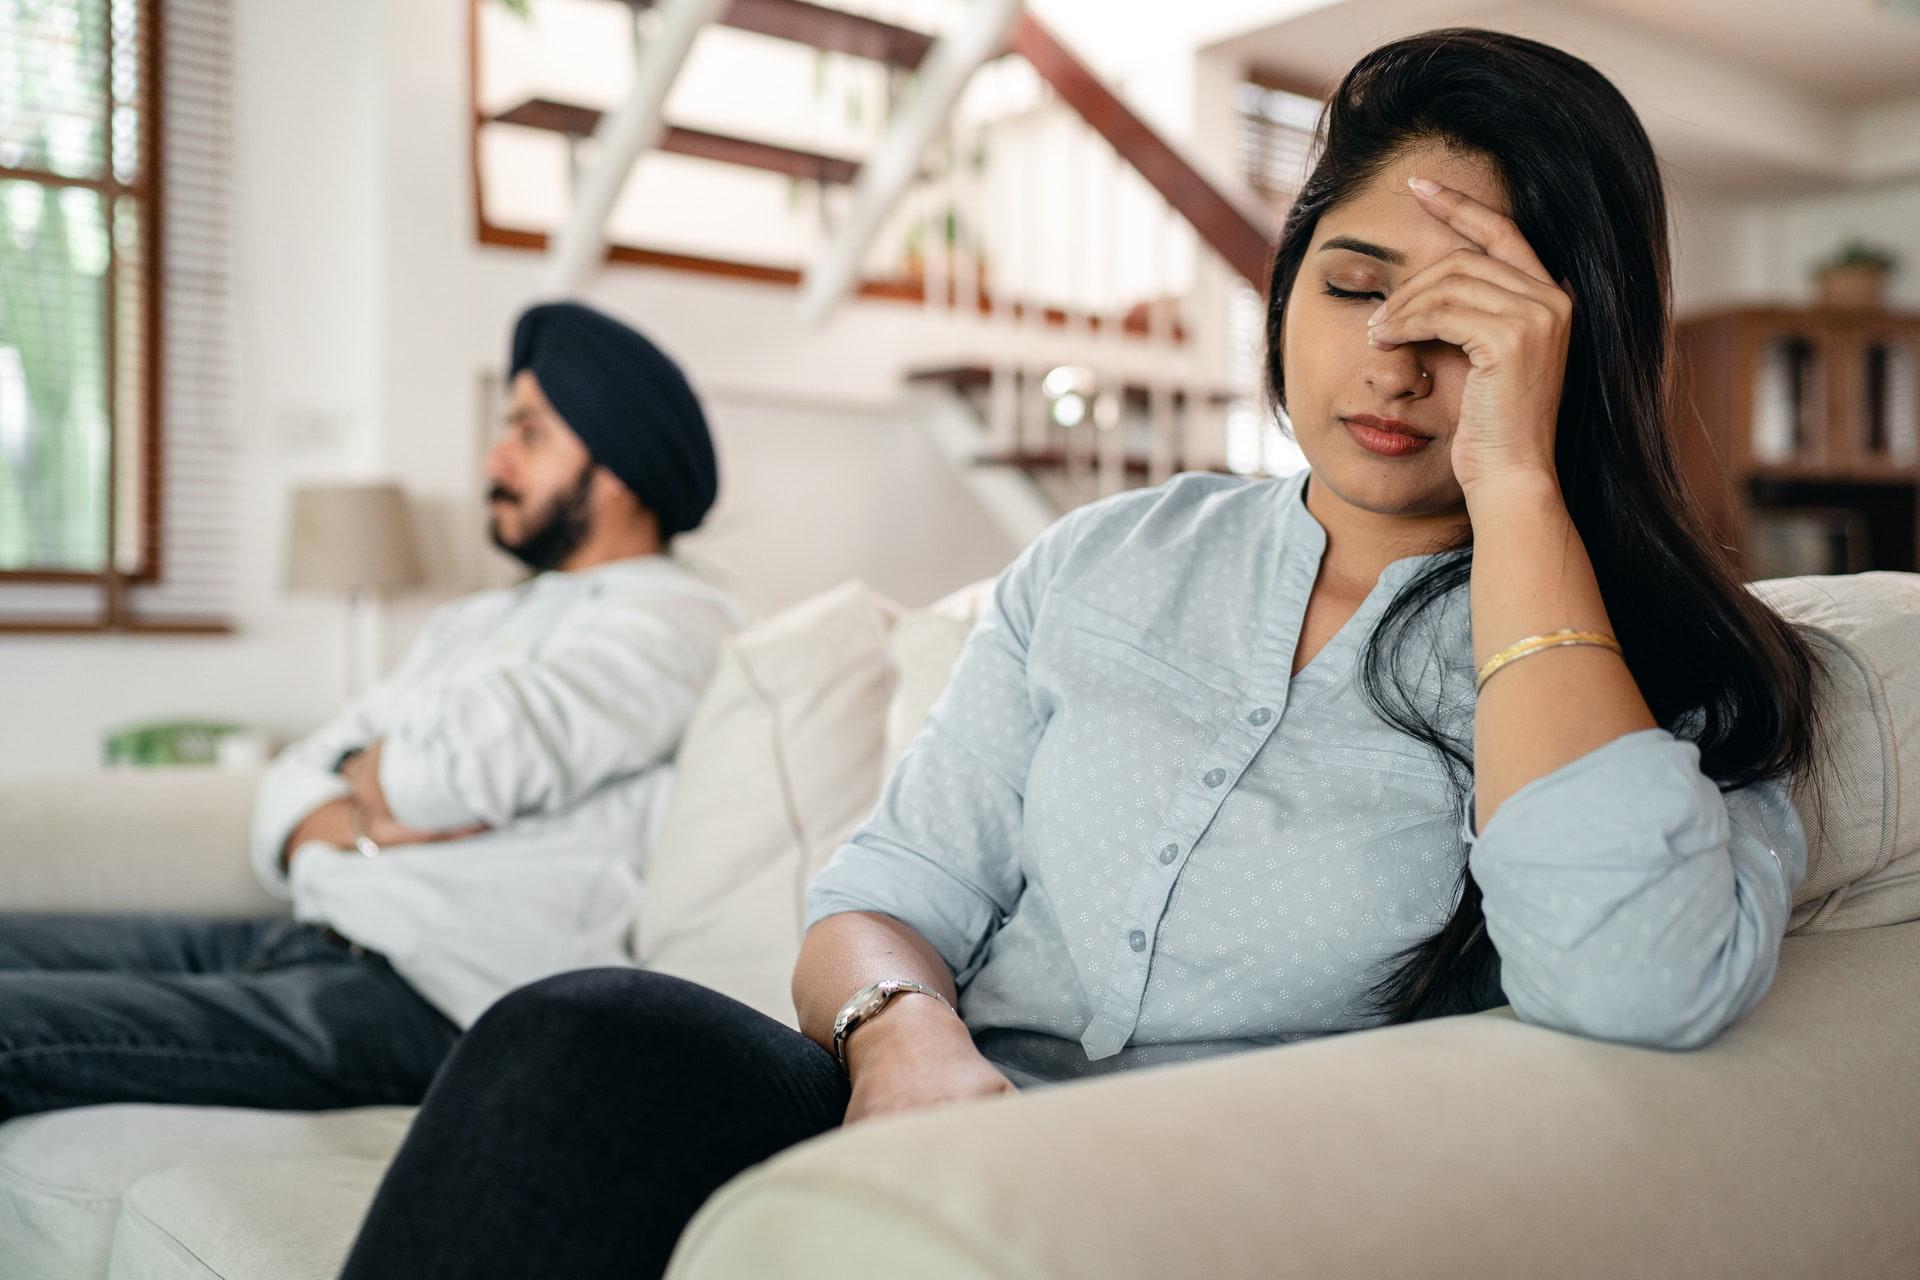 3 Harsh Reasons Why You Break-Up